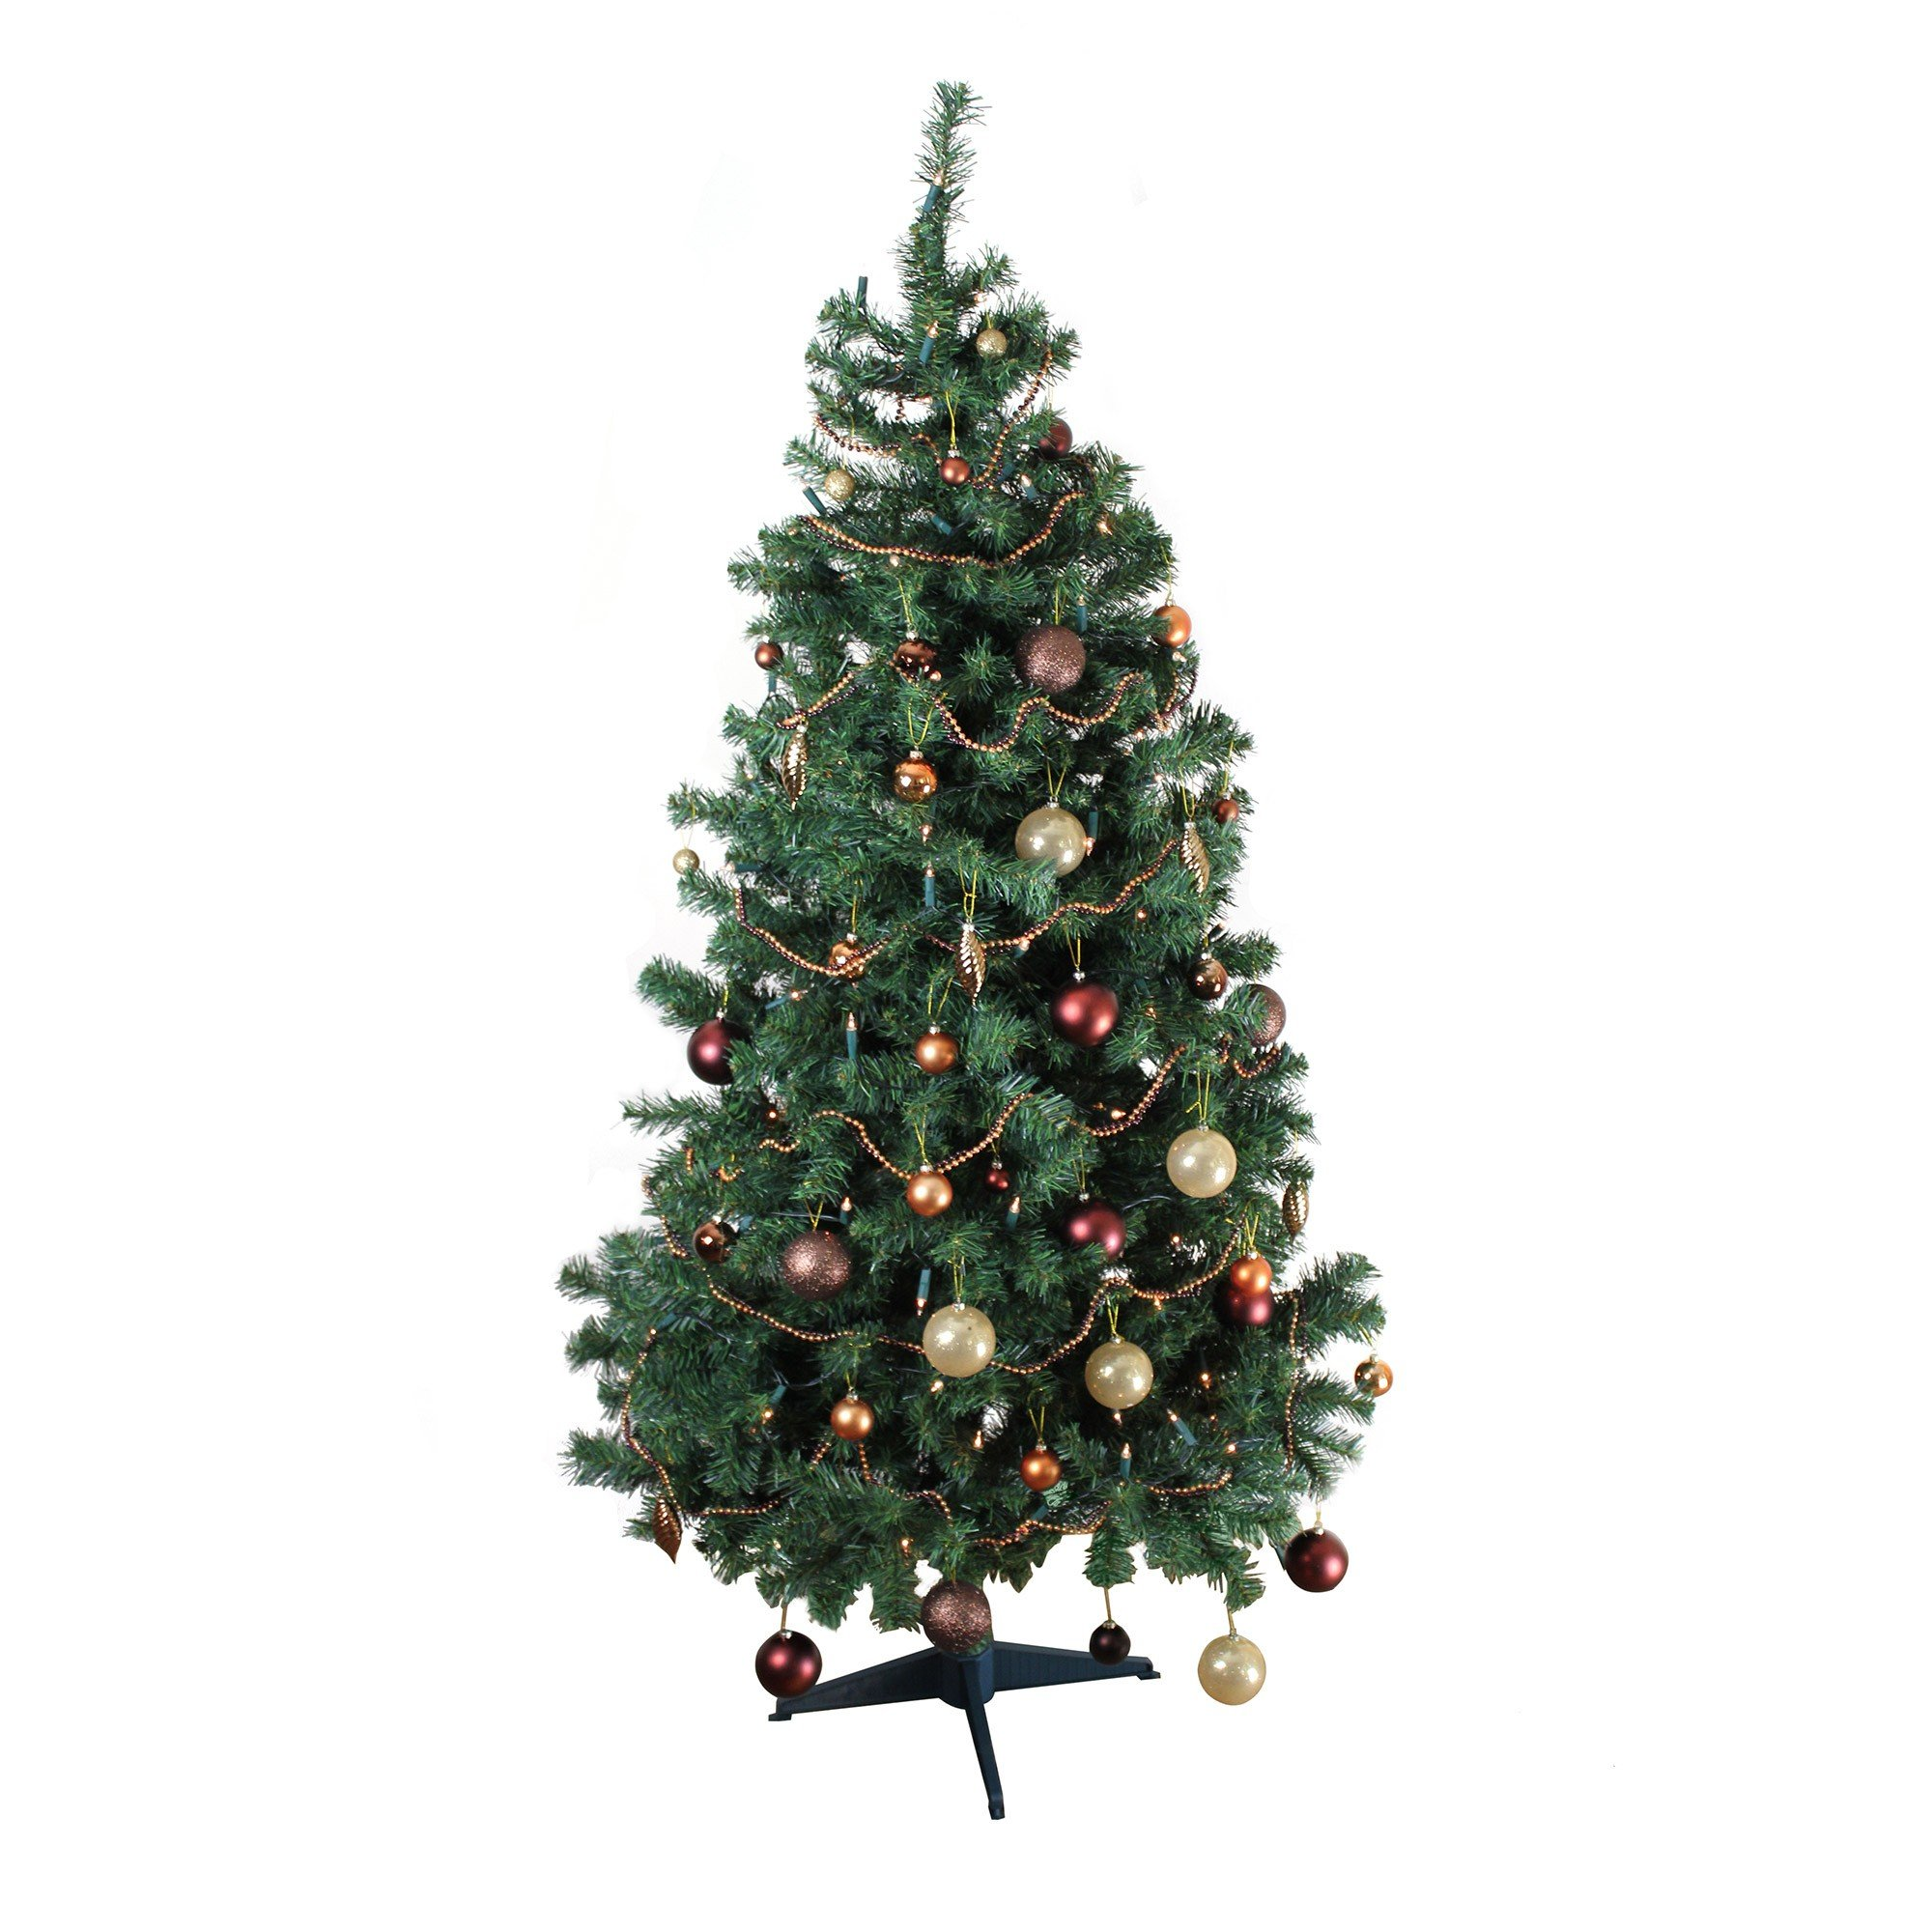 Homegear Deluxe Alpine 6ft 700 Tips Xmas/Christmas Tree